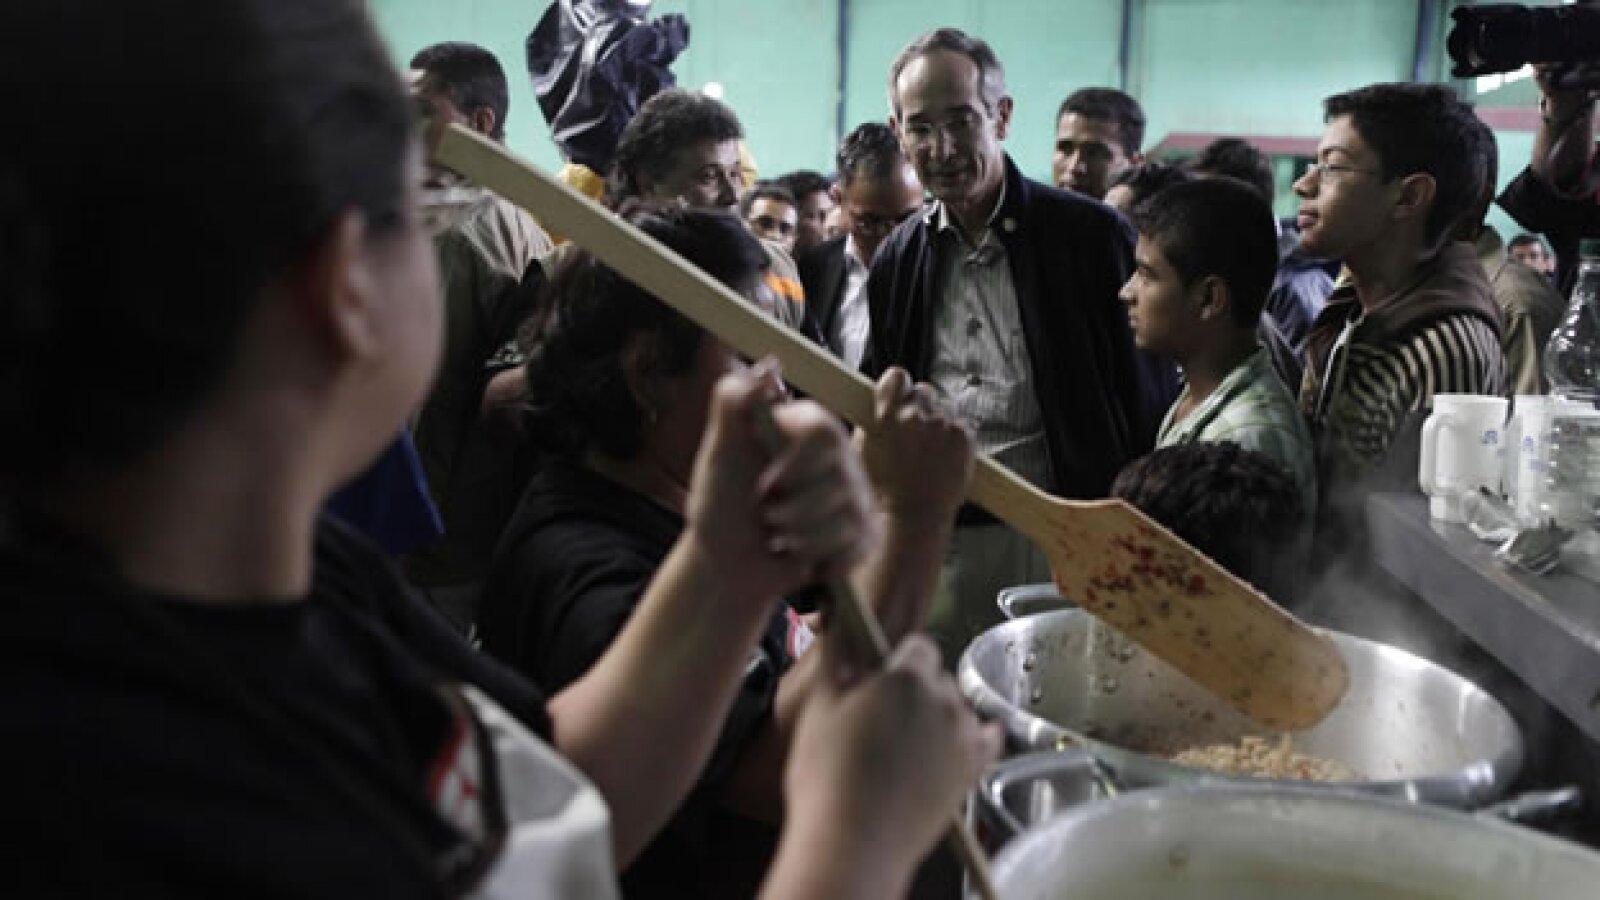 Visita del presidente de Guatemala a refugio